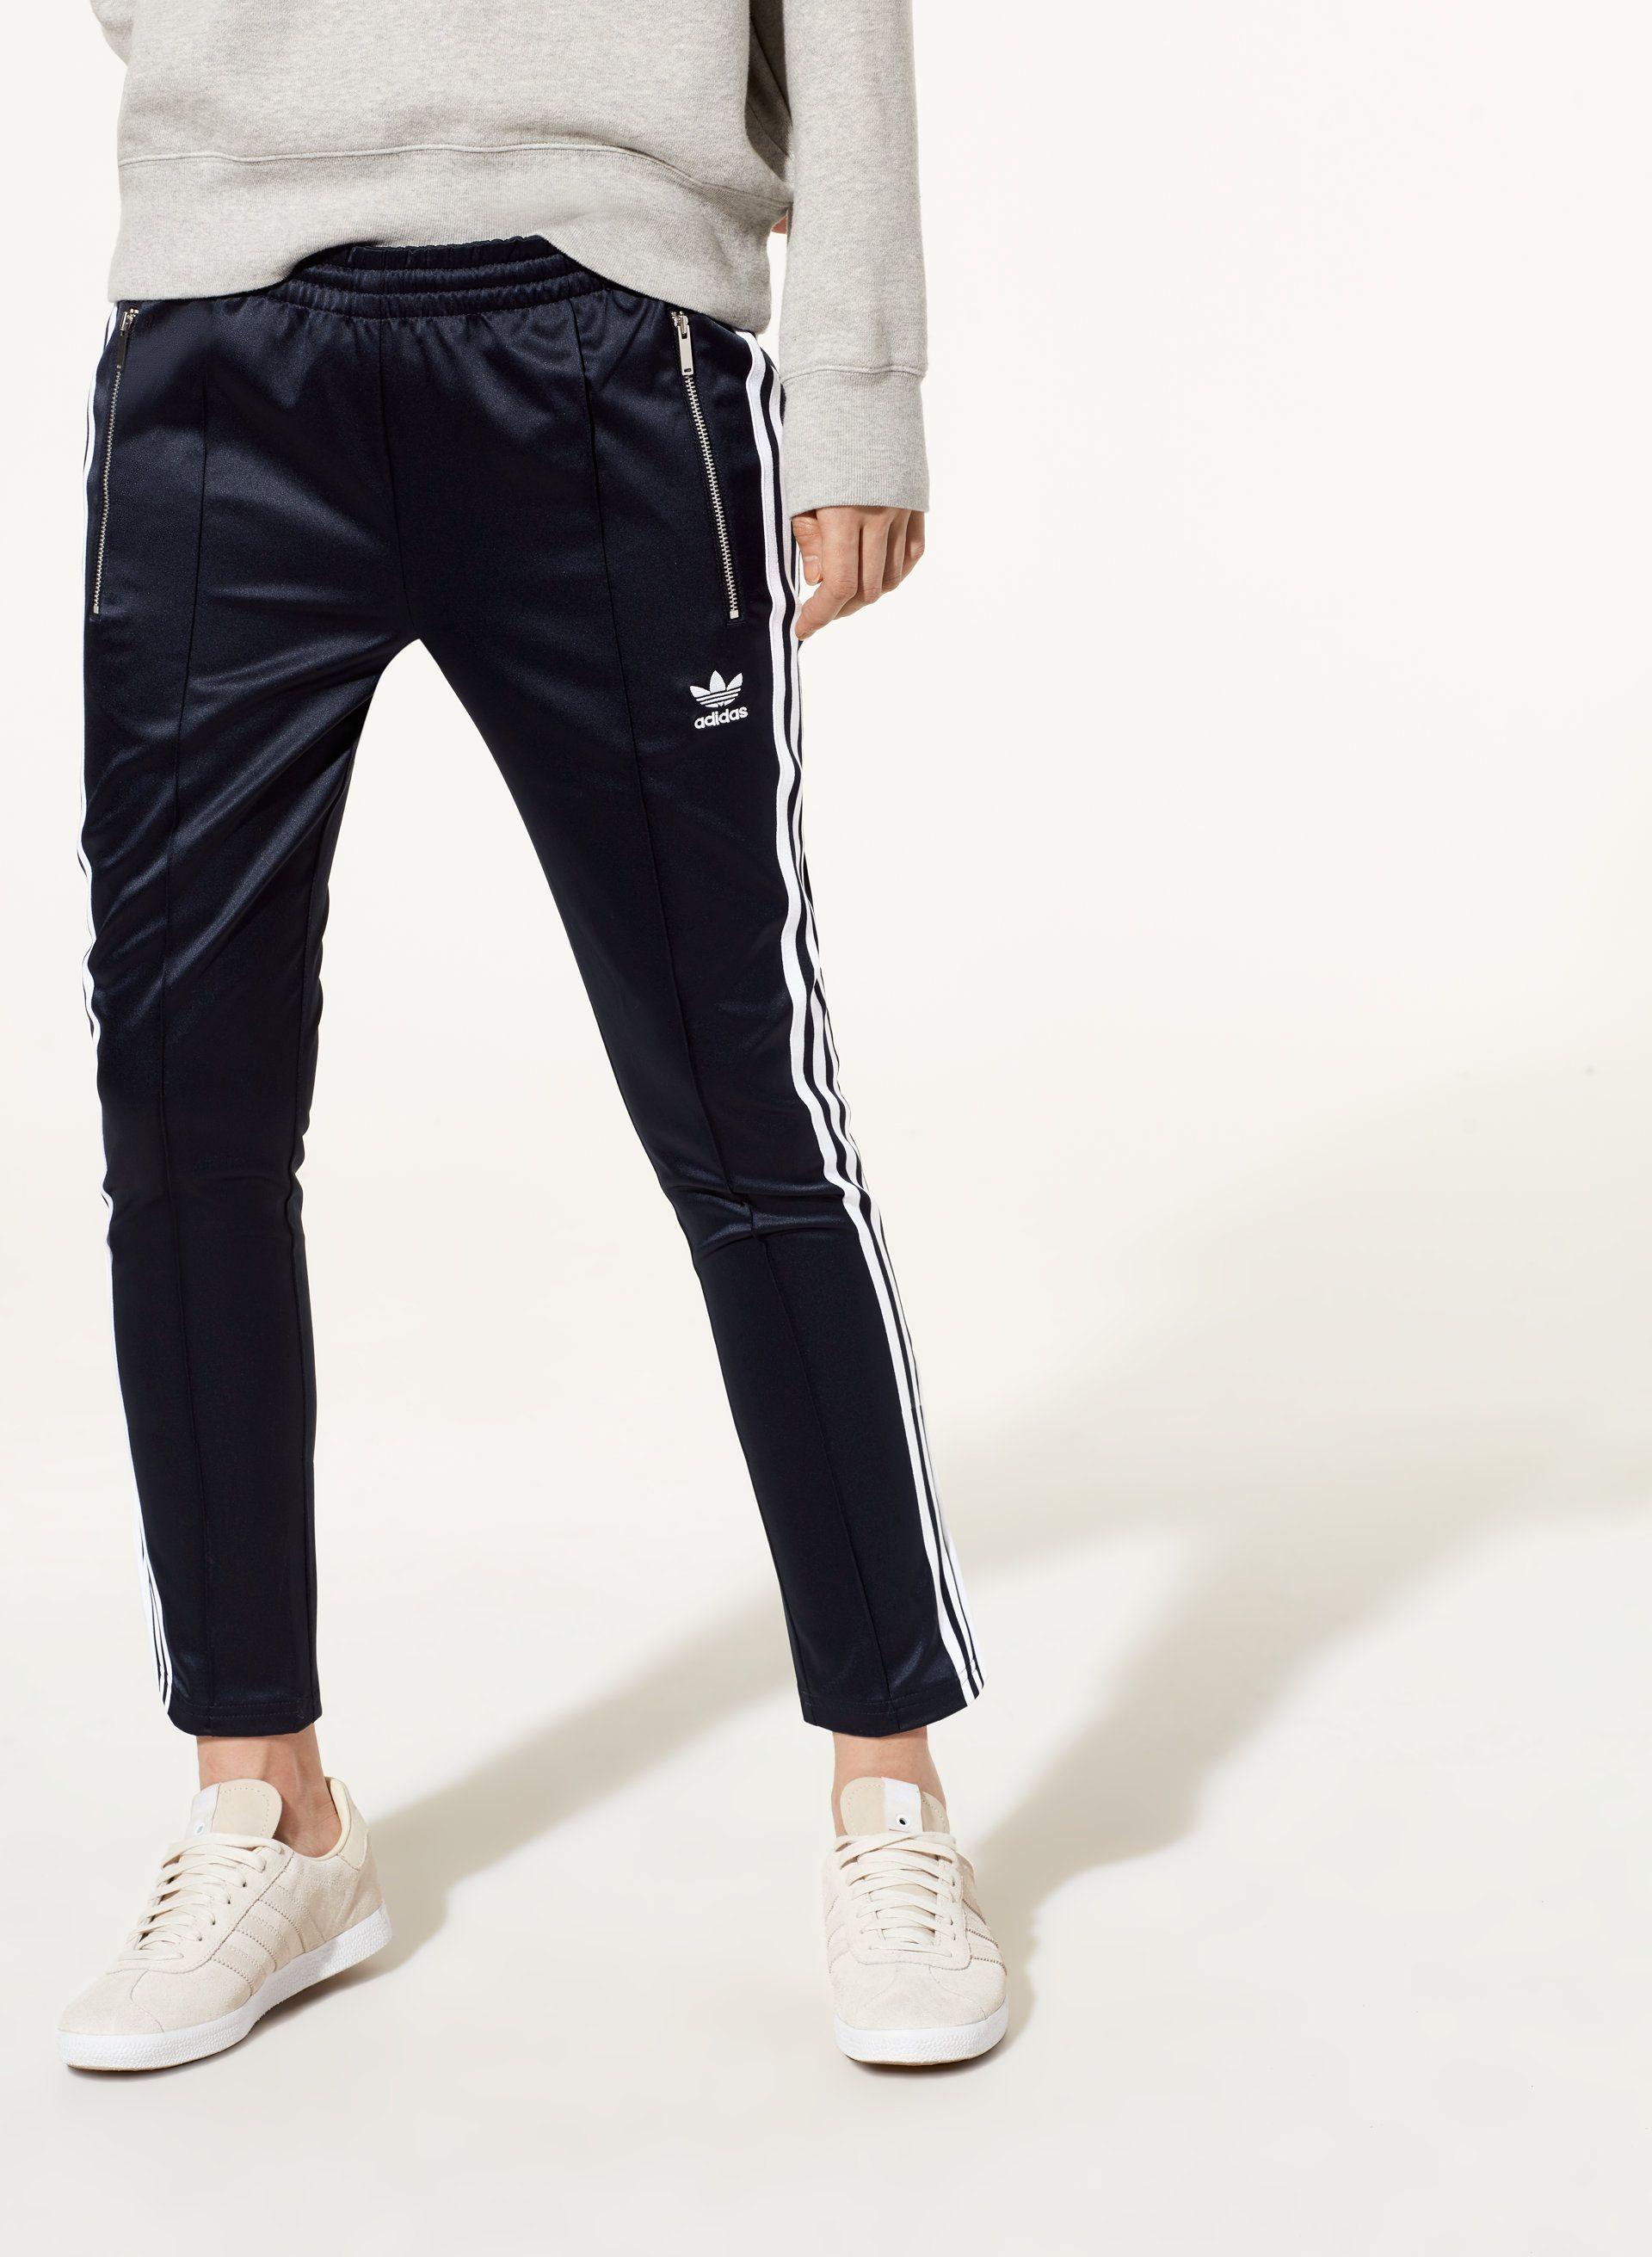 best sneakers 3b710 8d453 Adidas SATIN CIGARETTE PANT | Aritzia | My Adidas | Cigarette pants ...